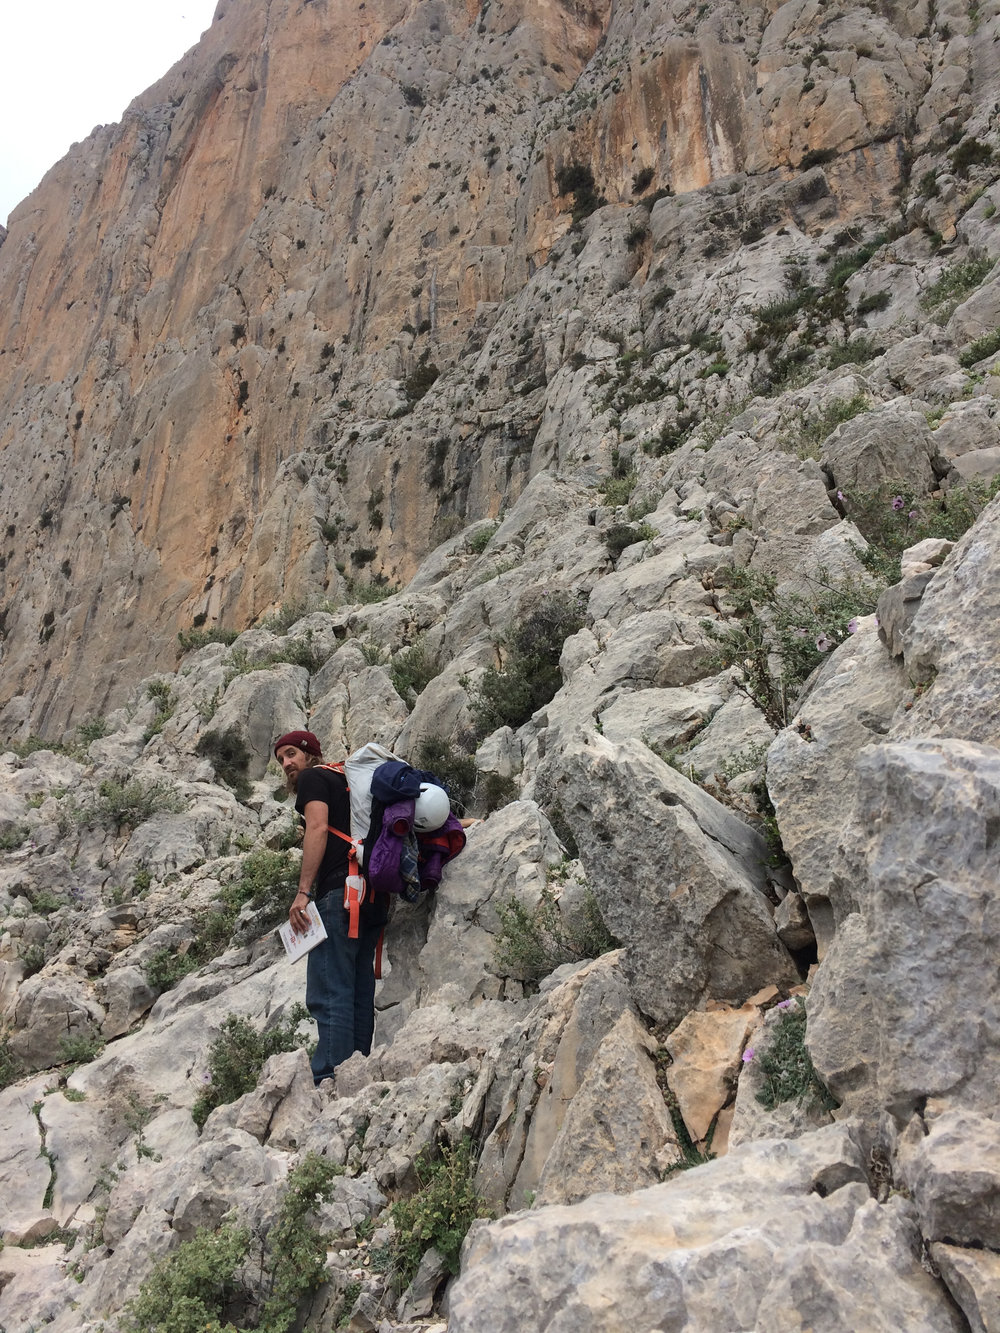 climbinginspain-15.jpg